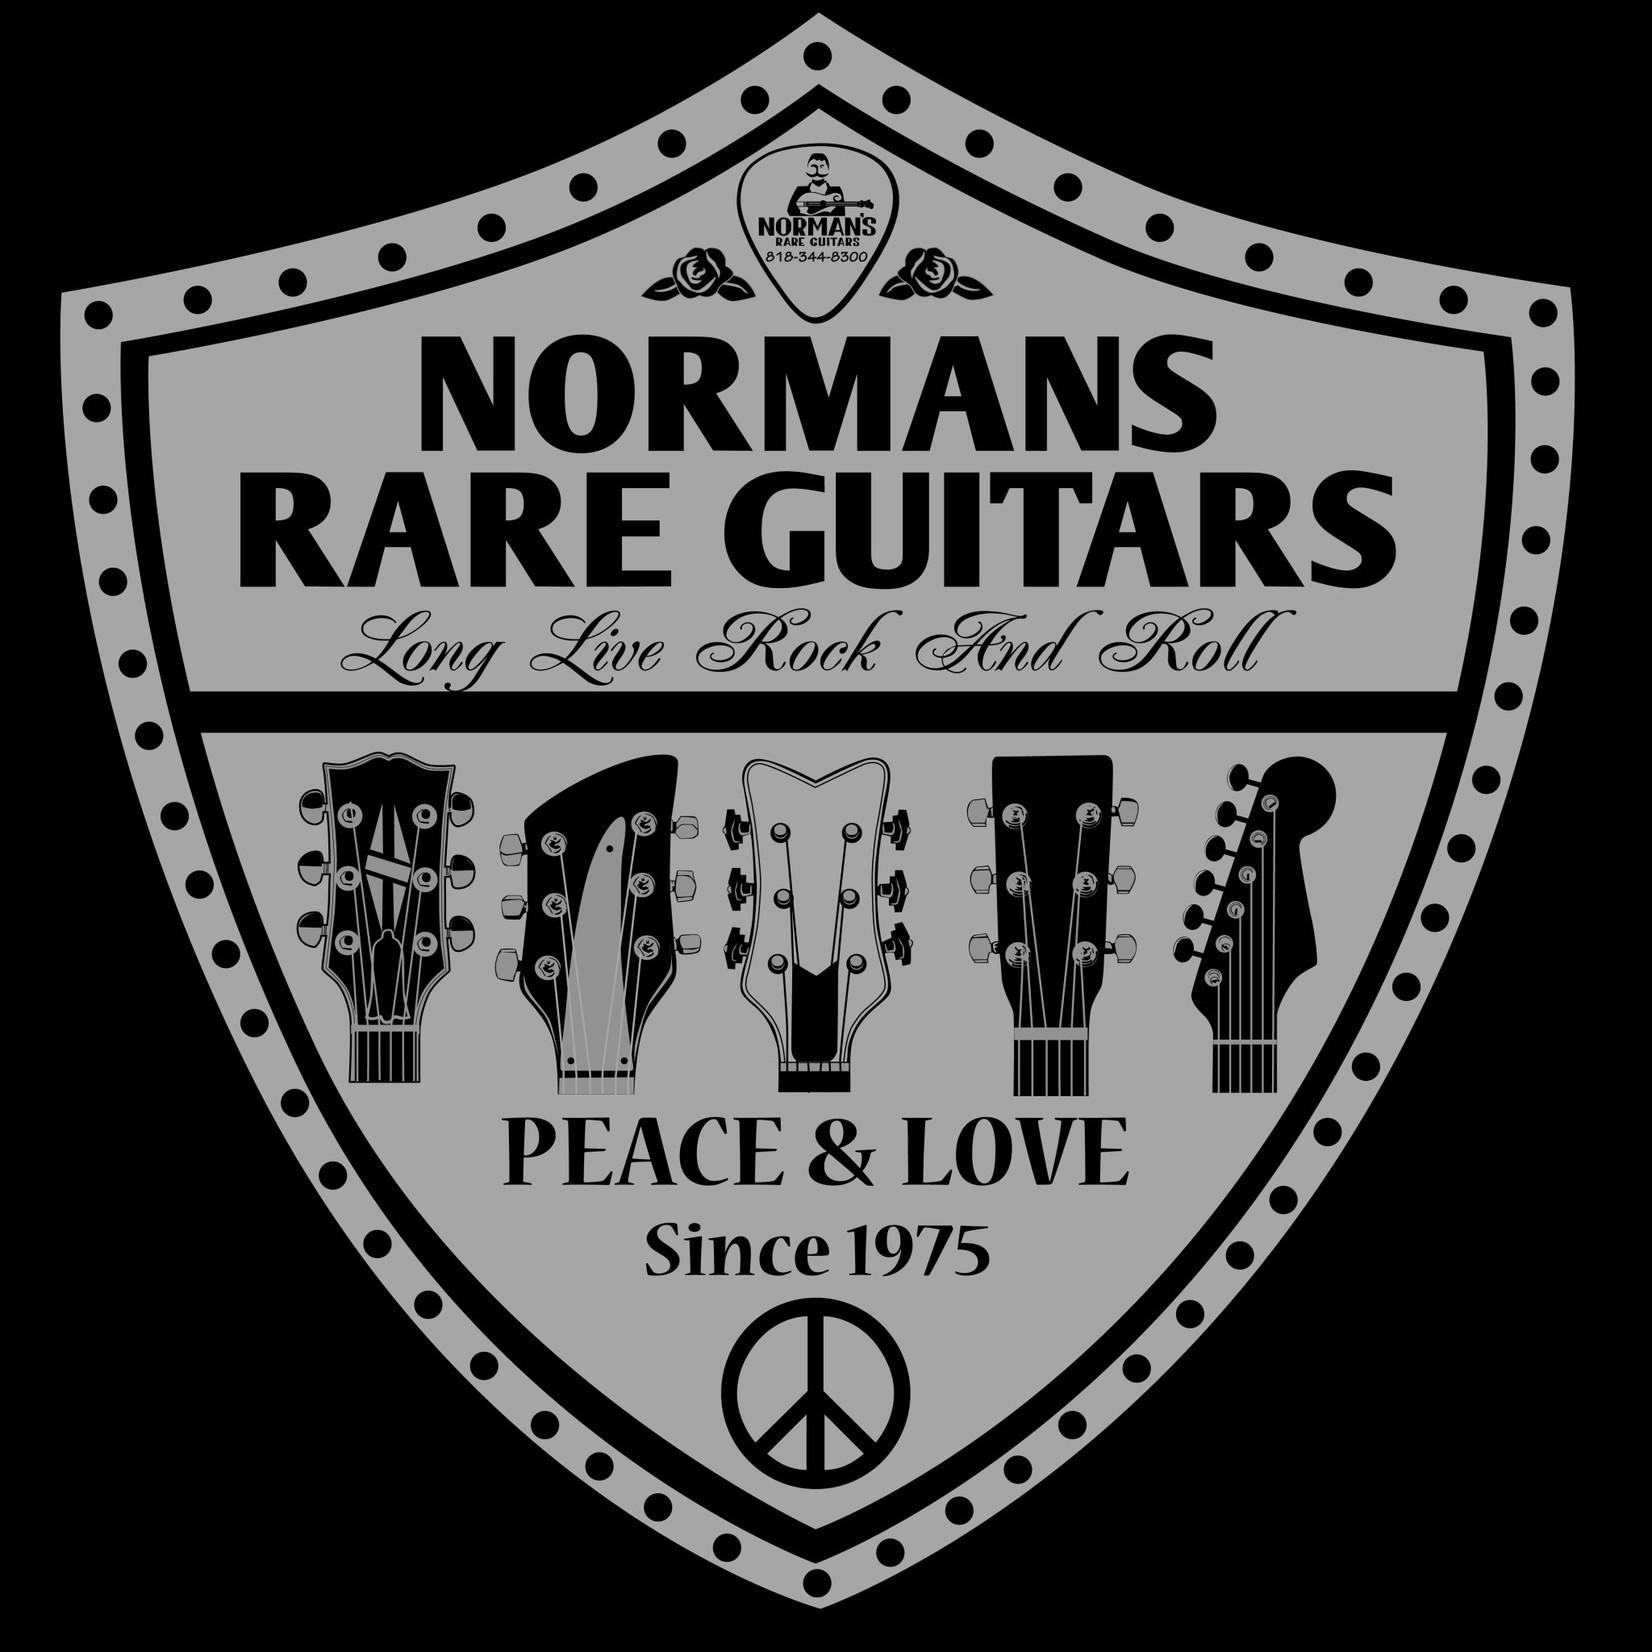 Norman's Rare Guitars Peace & Love T-Shirt